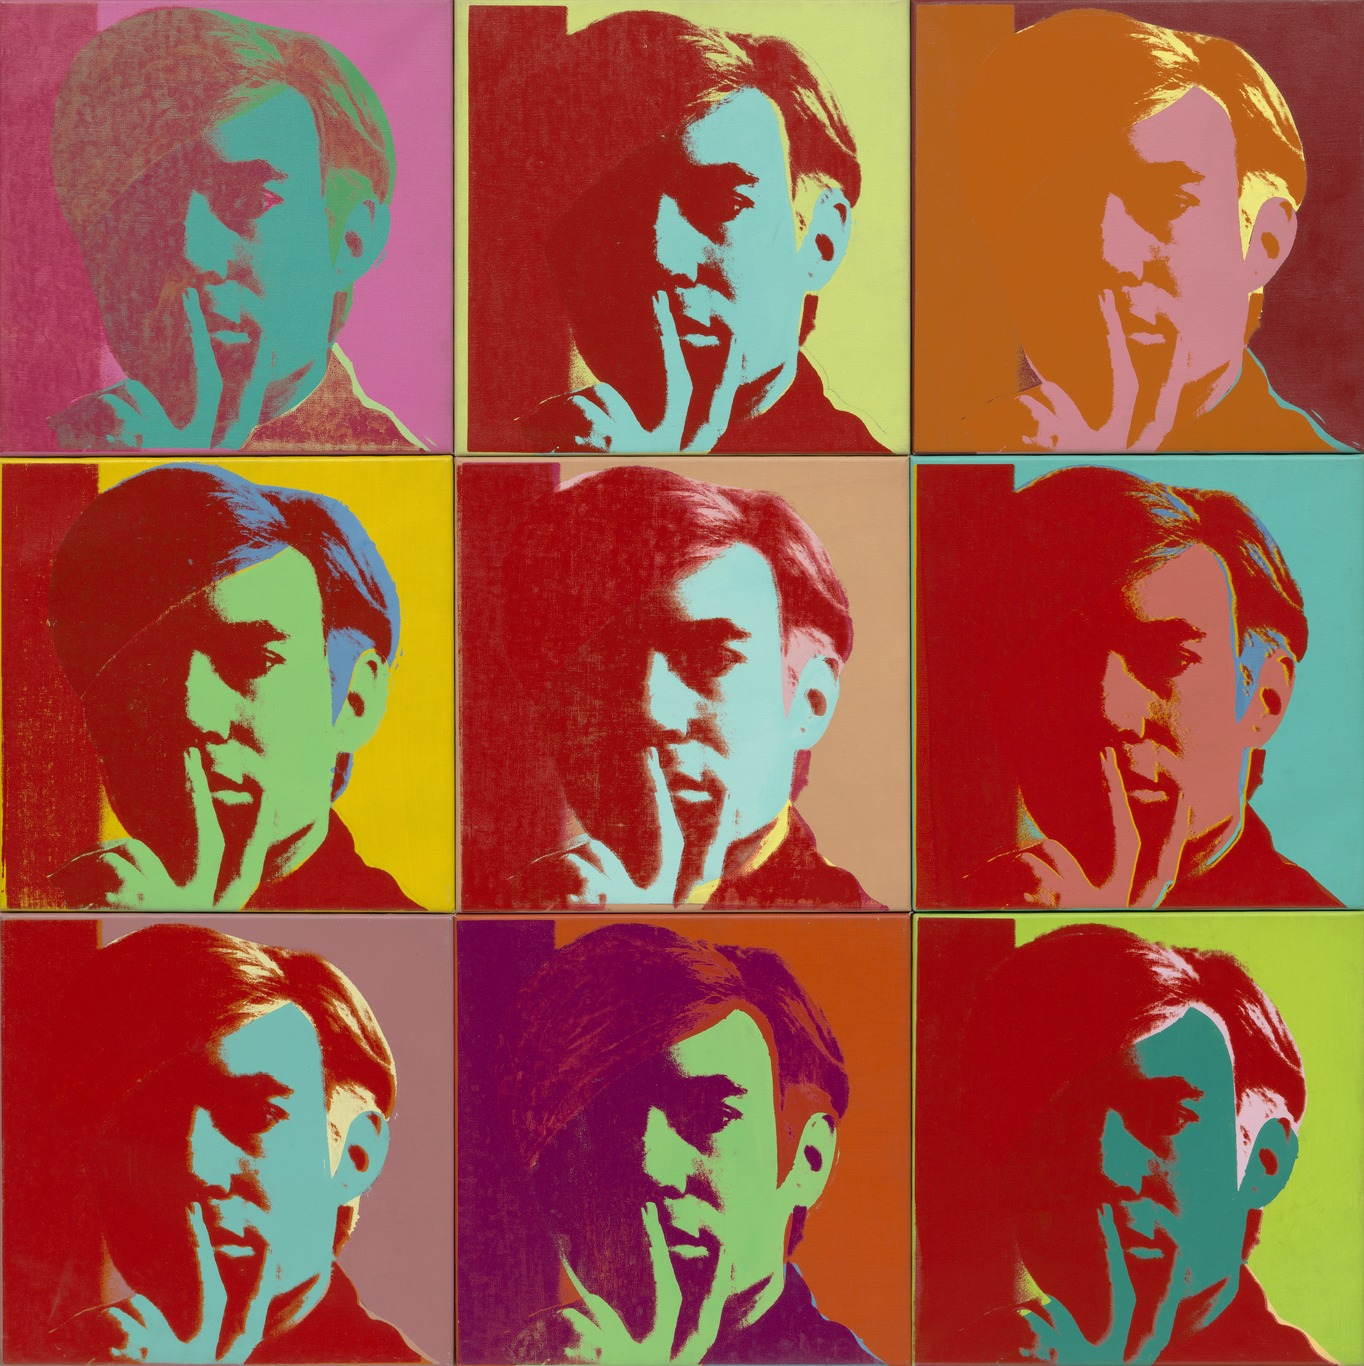 Andy Warhol, Self-Portrait, 1966, 9 Canvases, Museum of Modern Art: https://www.moma.org/media/W1siZiIsIjM0MjYyMiJdLFsicCIsImNvbnZlcnQiLCItcmVzaXplIDEzNjZ4MTM2Nlx1MDAzZSJdXQ.jpg?sha=a2109c3bf865cd29